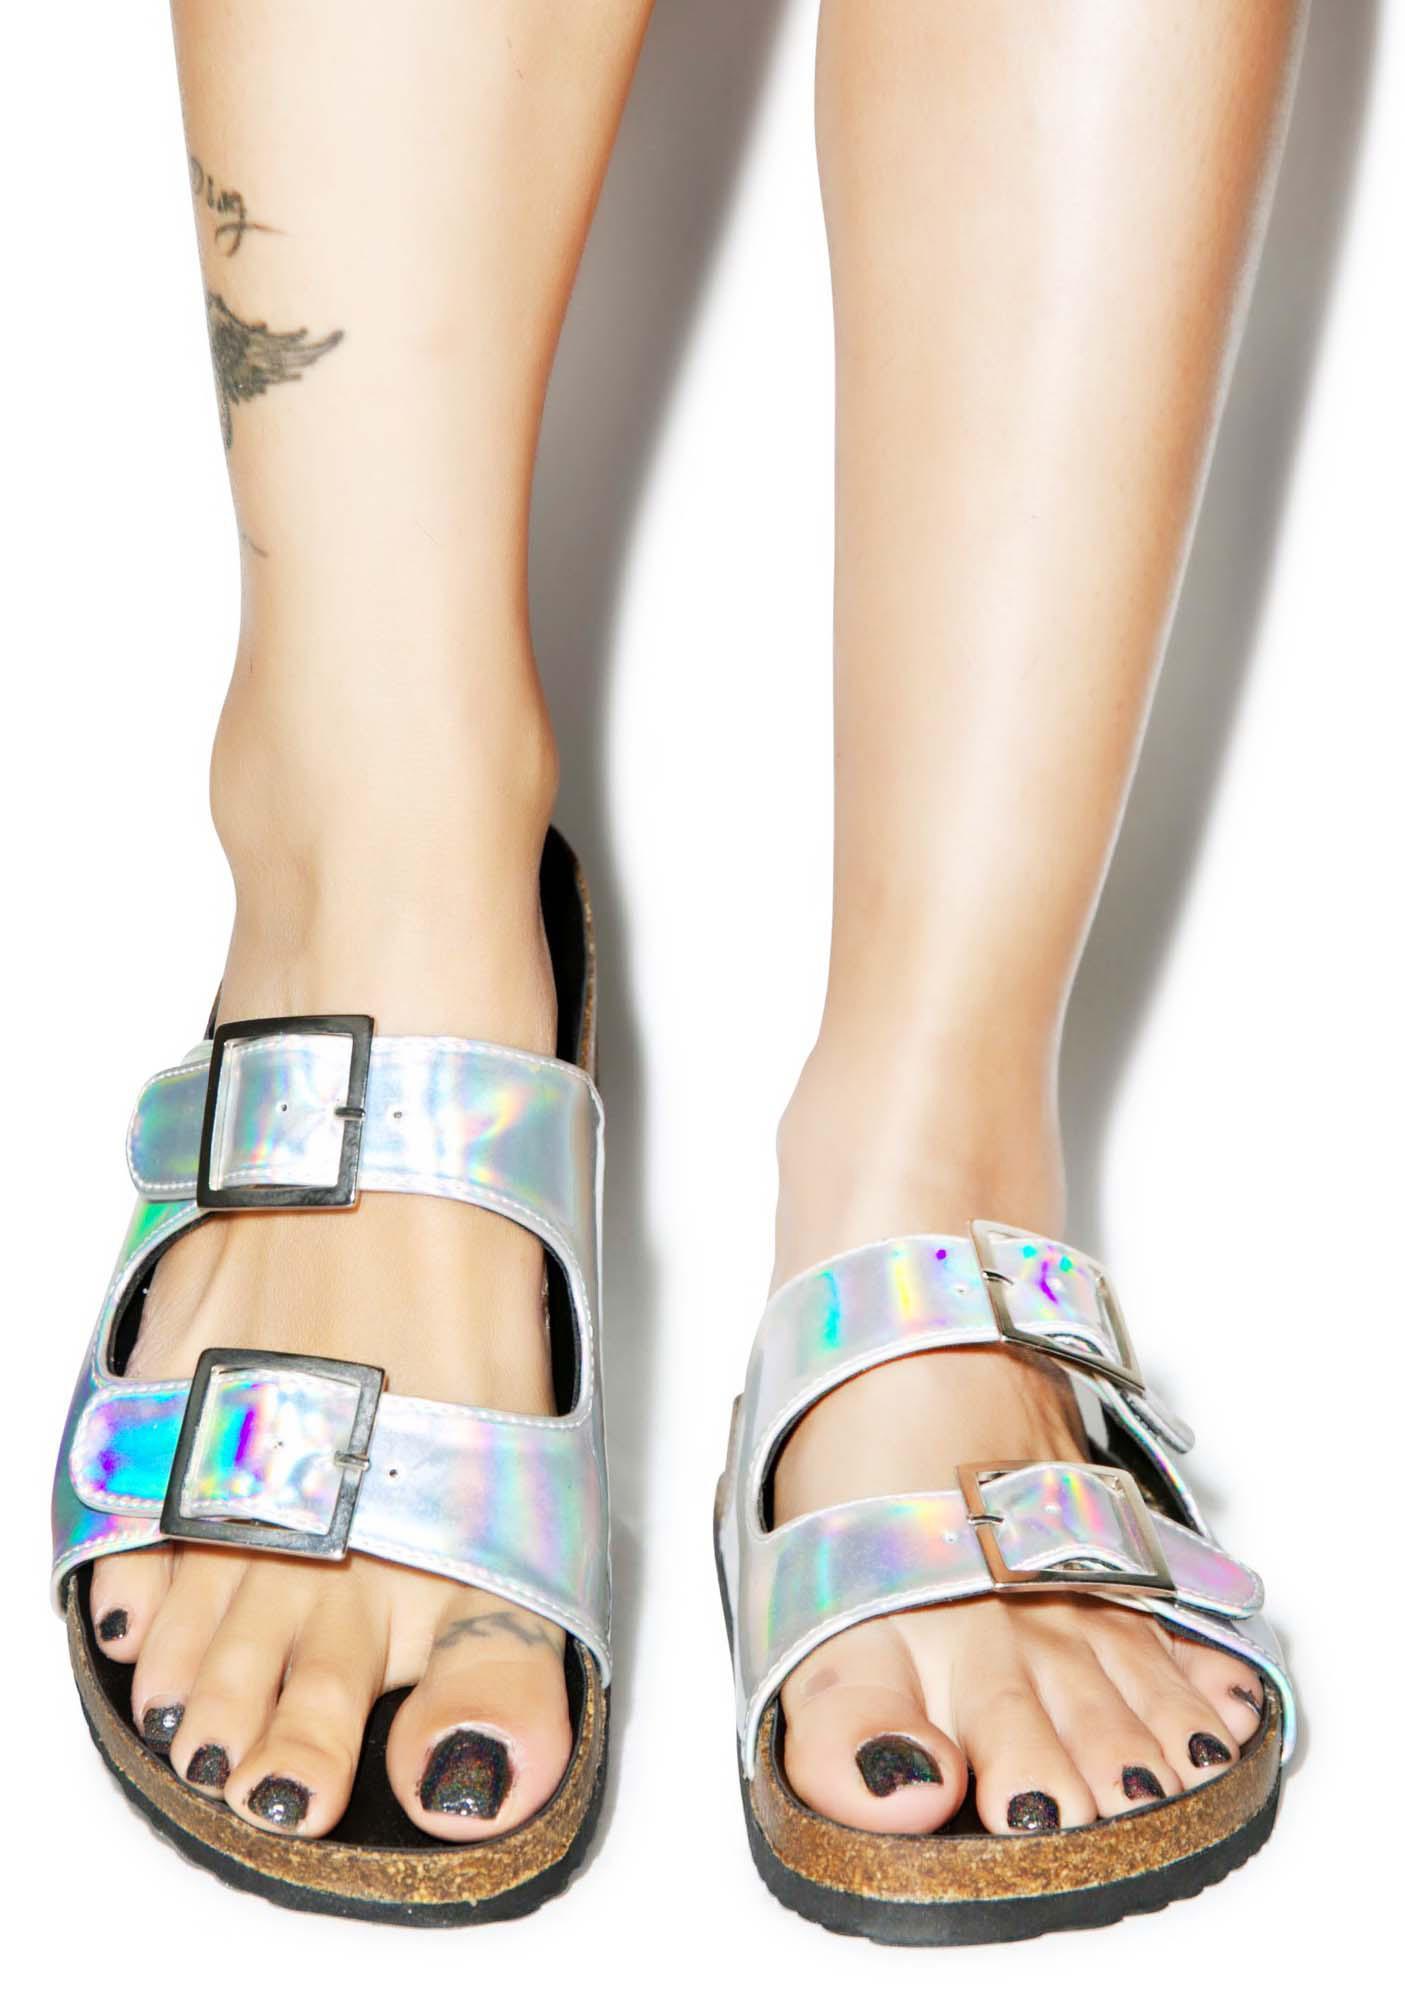 O Mighty Hella Hologram Sandals